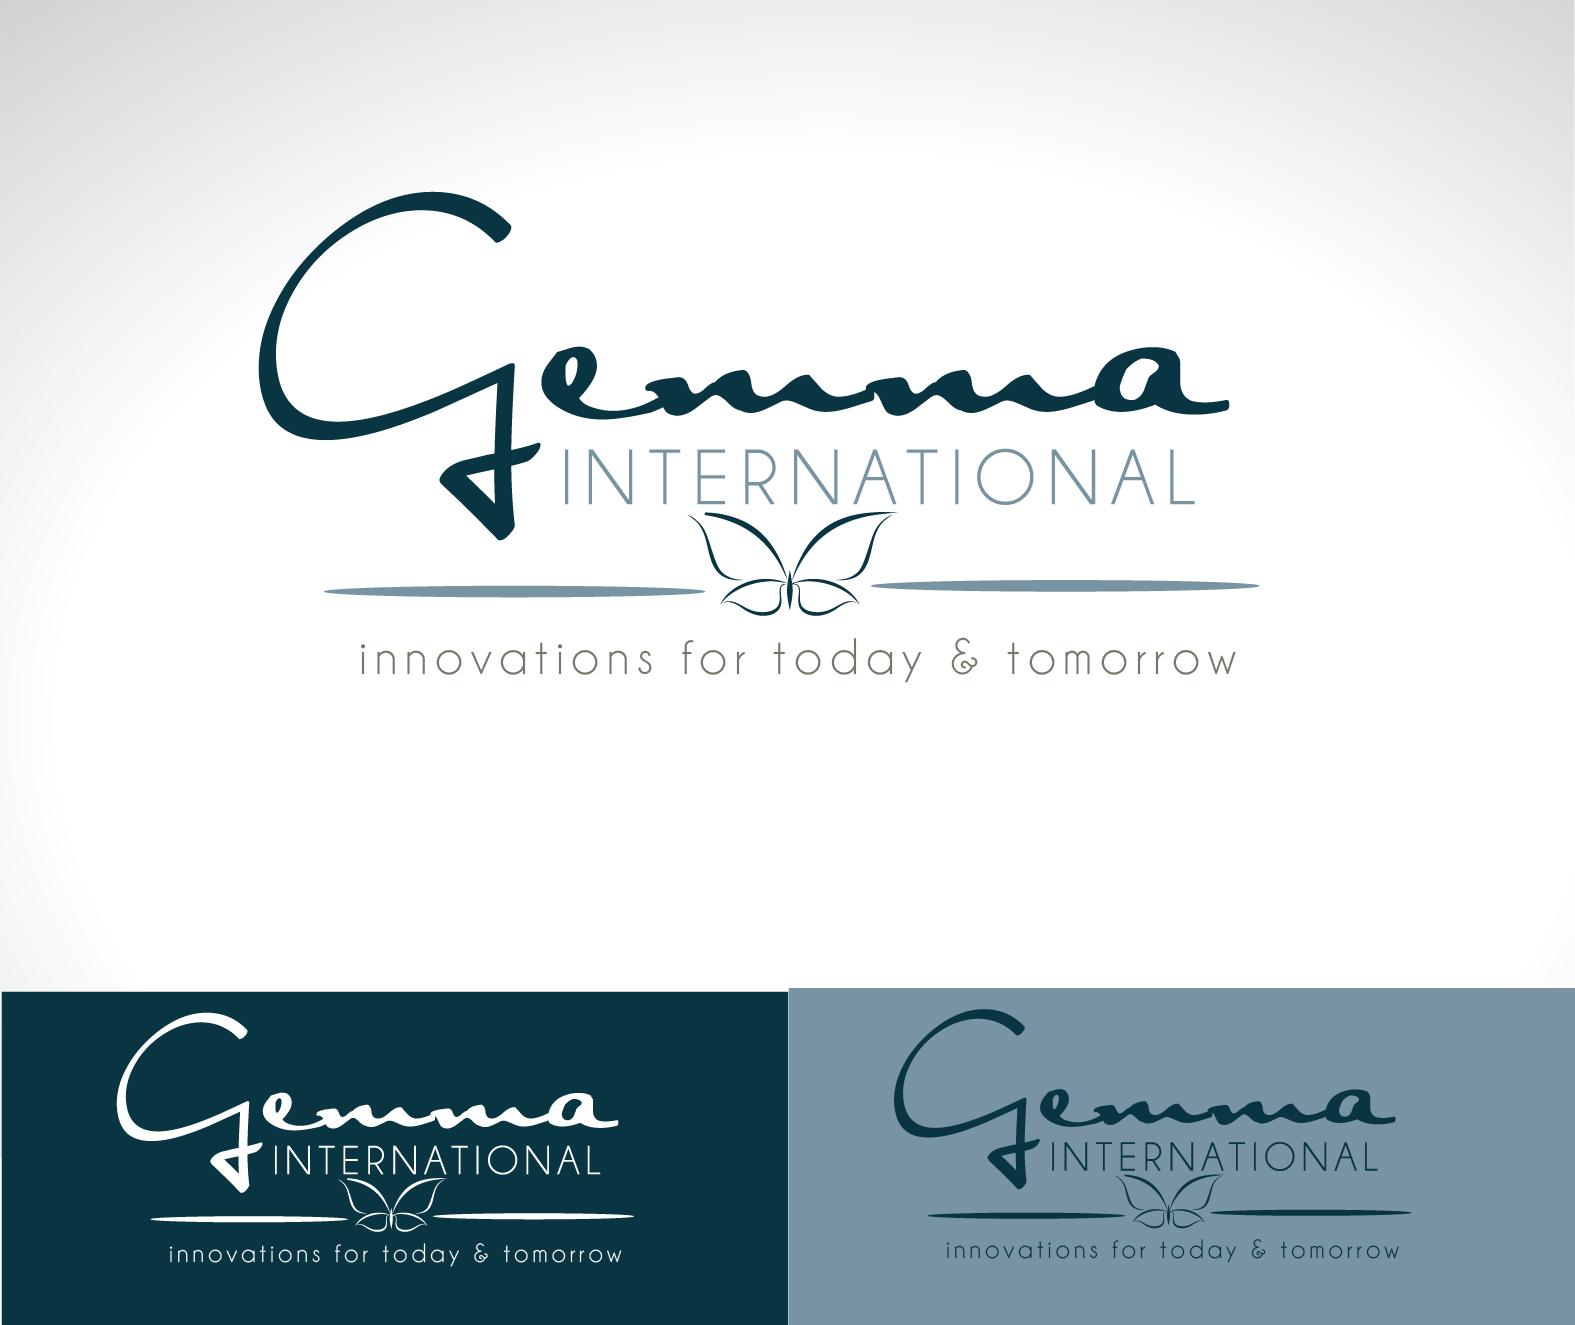 Logo Design by Darina Dimitrova - Entry No. 130 in the Logo Design Contest Artistic Logo Design for Gemma International.